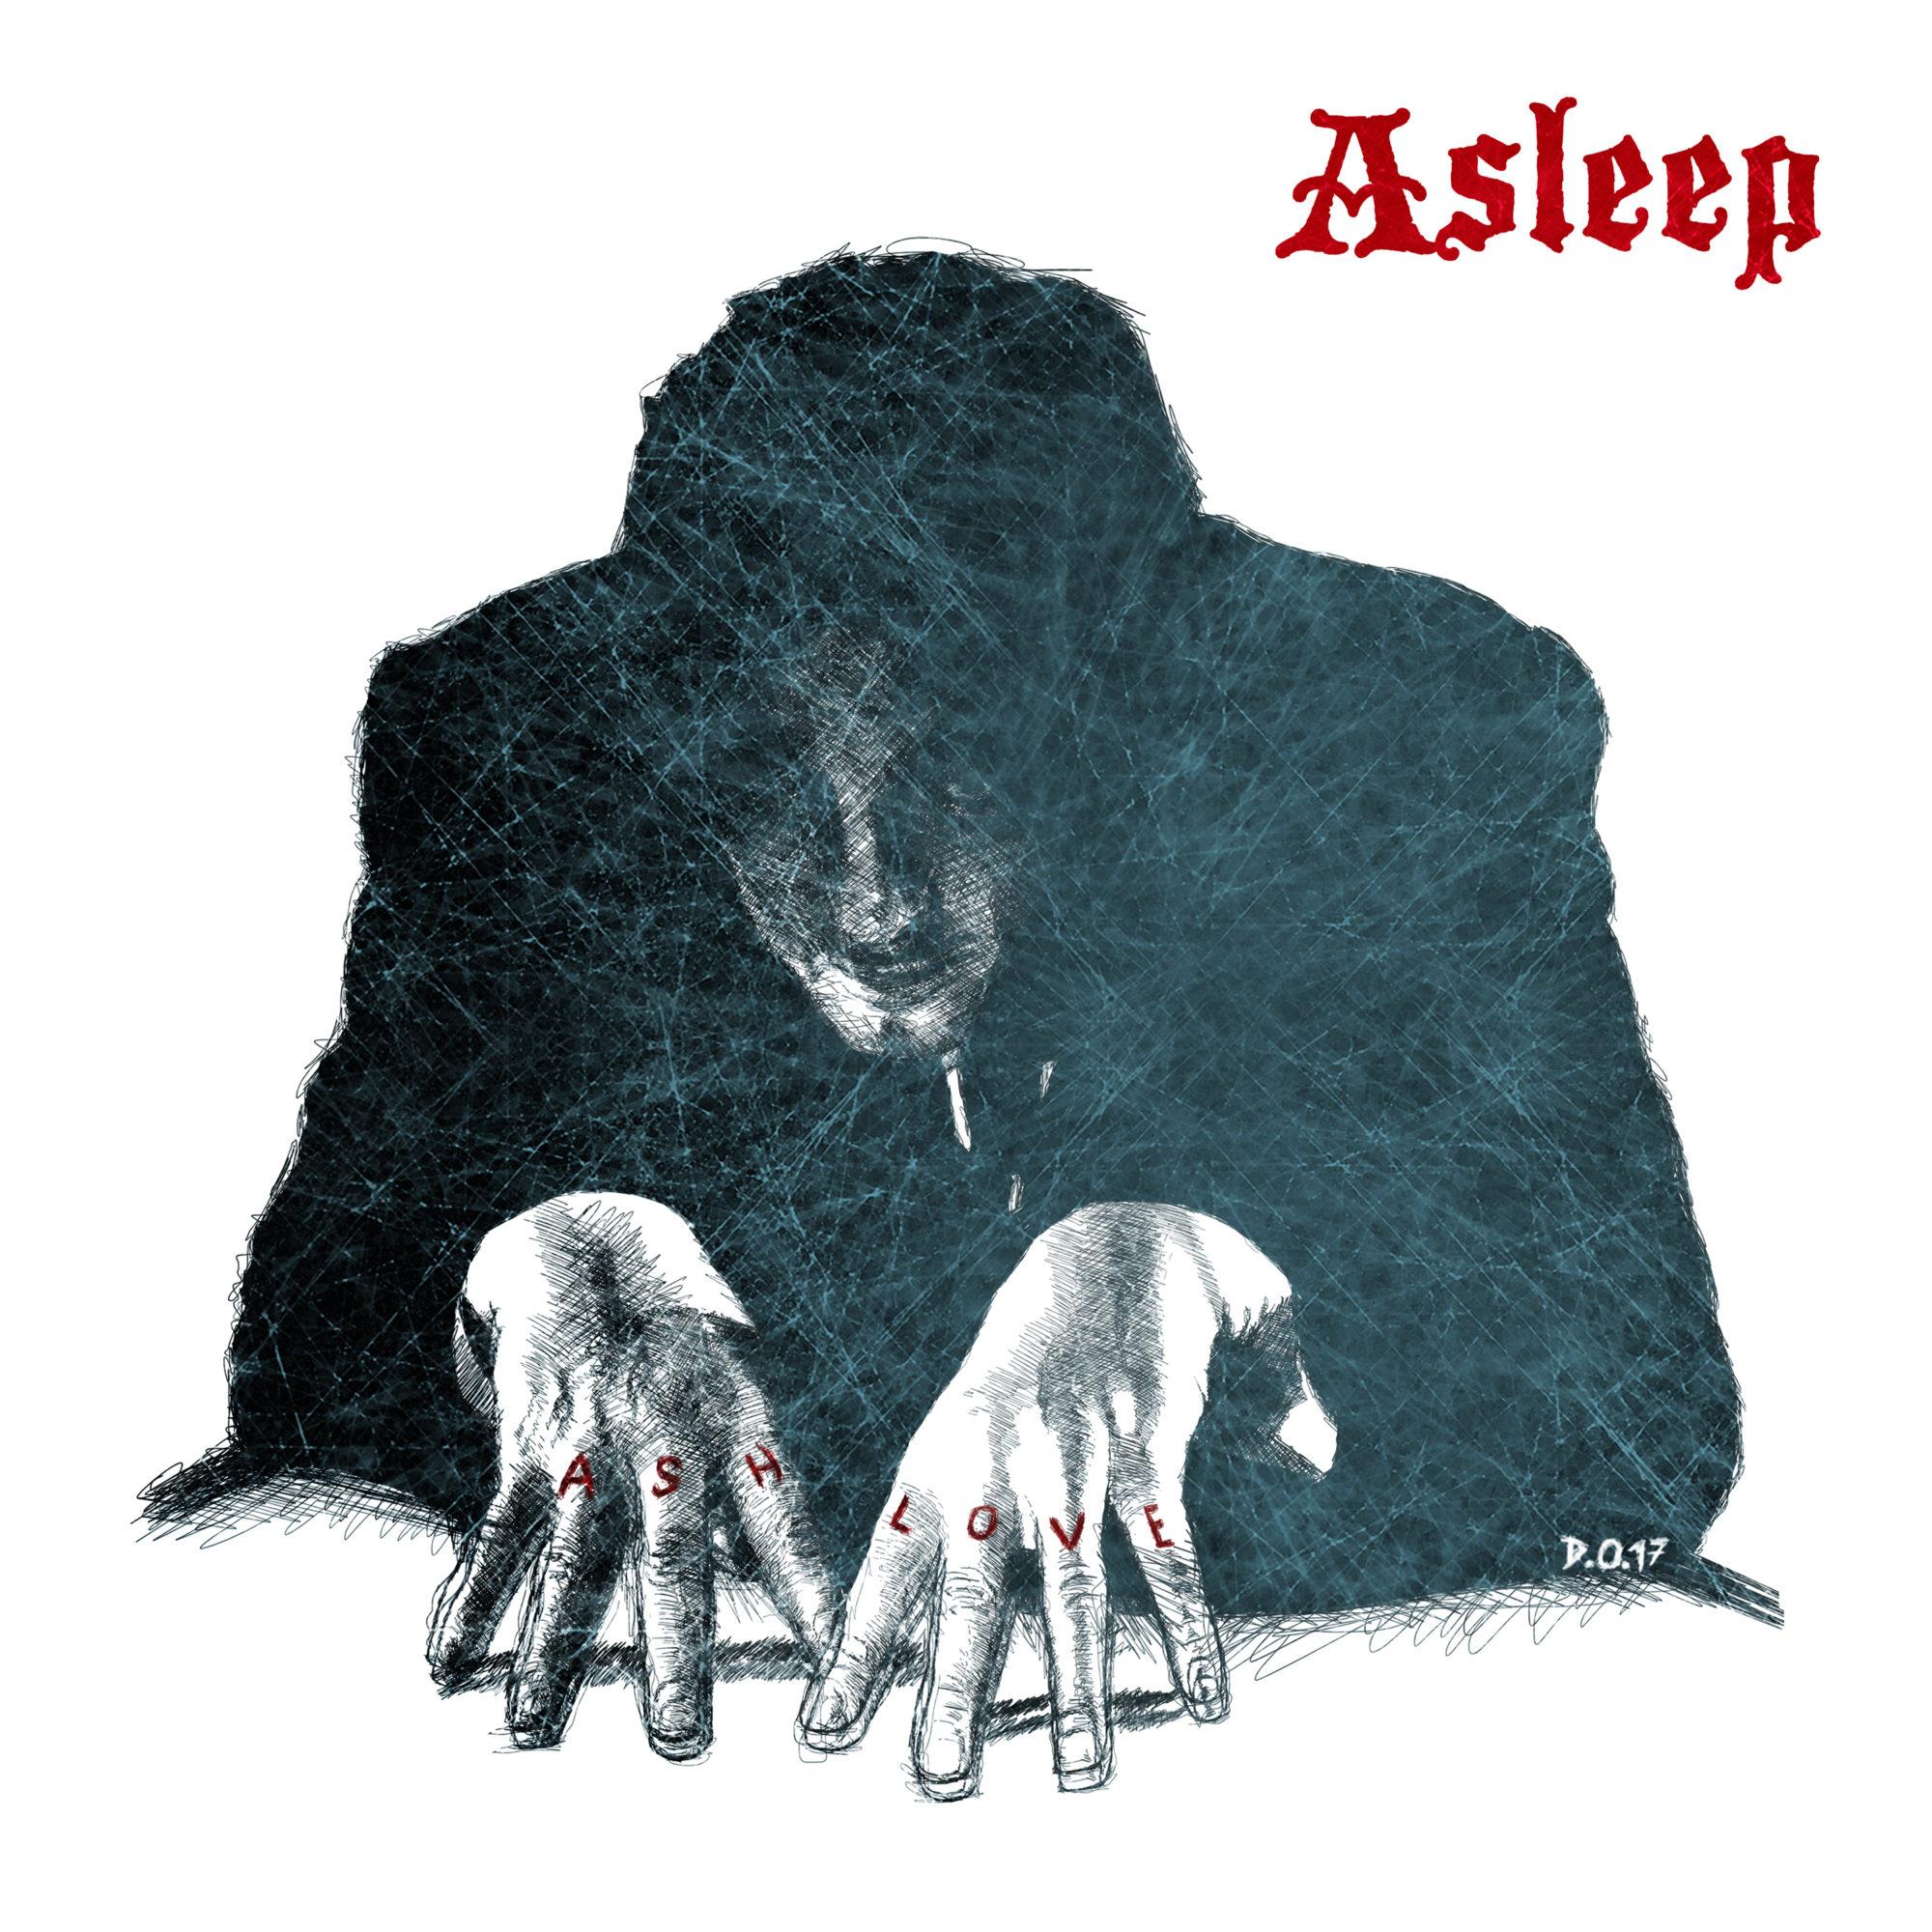 Ash my Love band music Austria Asleep single artwork